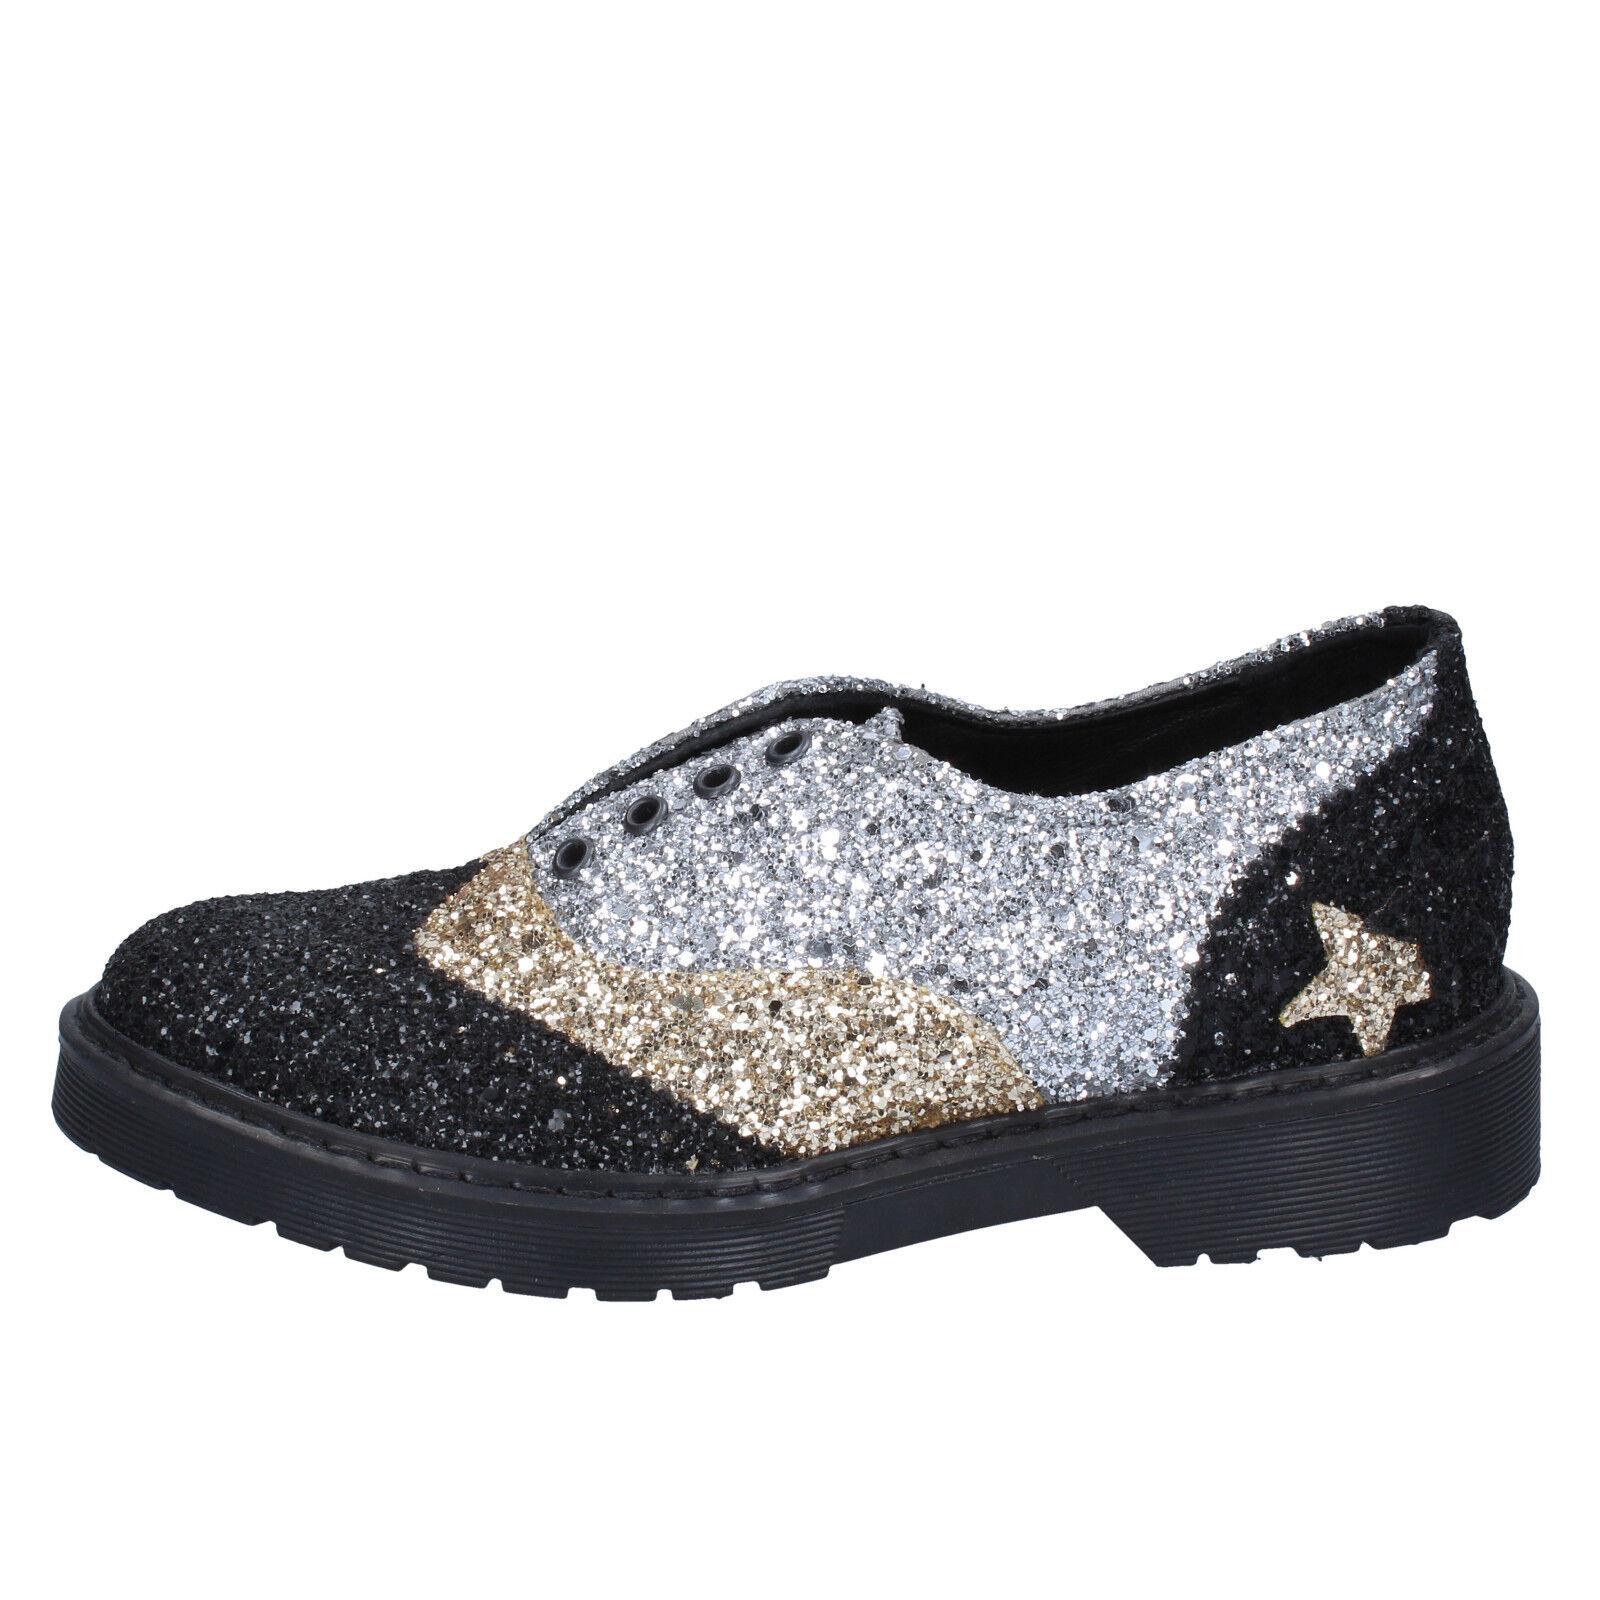 Damenss schuhe 2 STAR 4 (EU 37) elegant schwarz silver gold glitter BX379-37